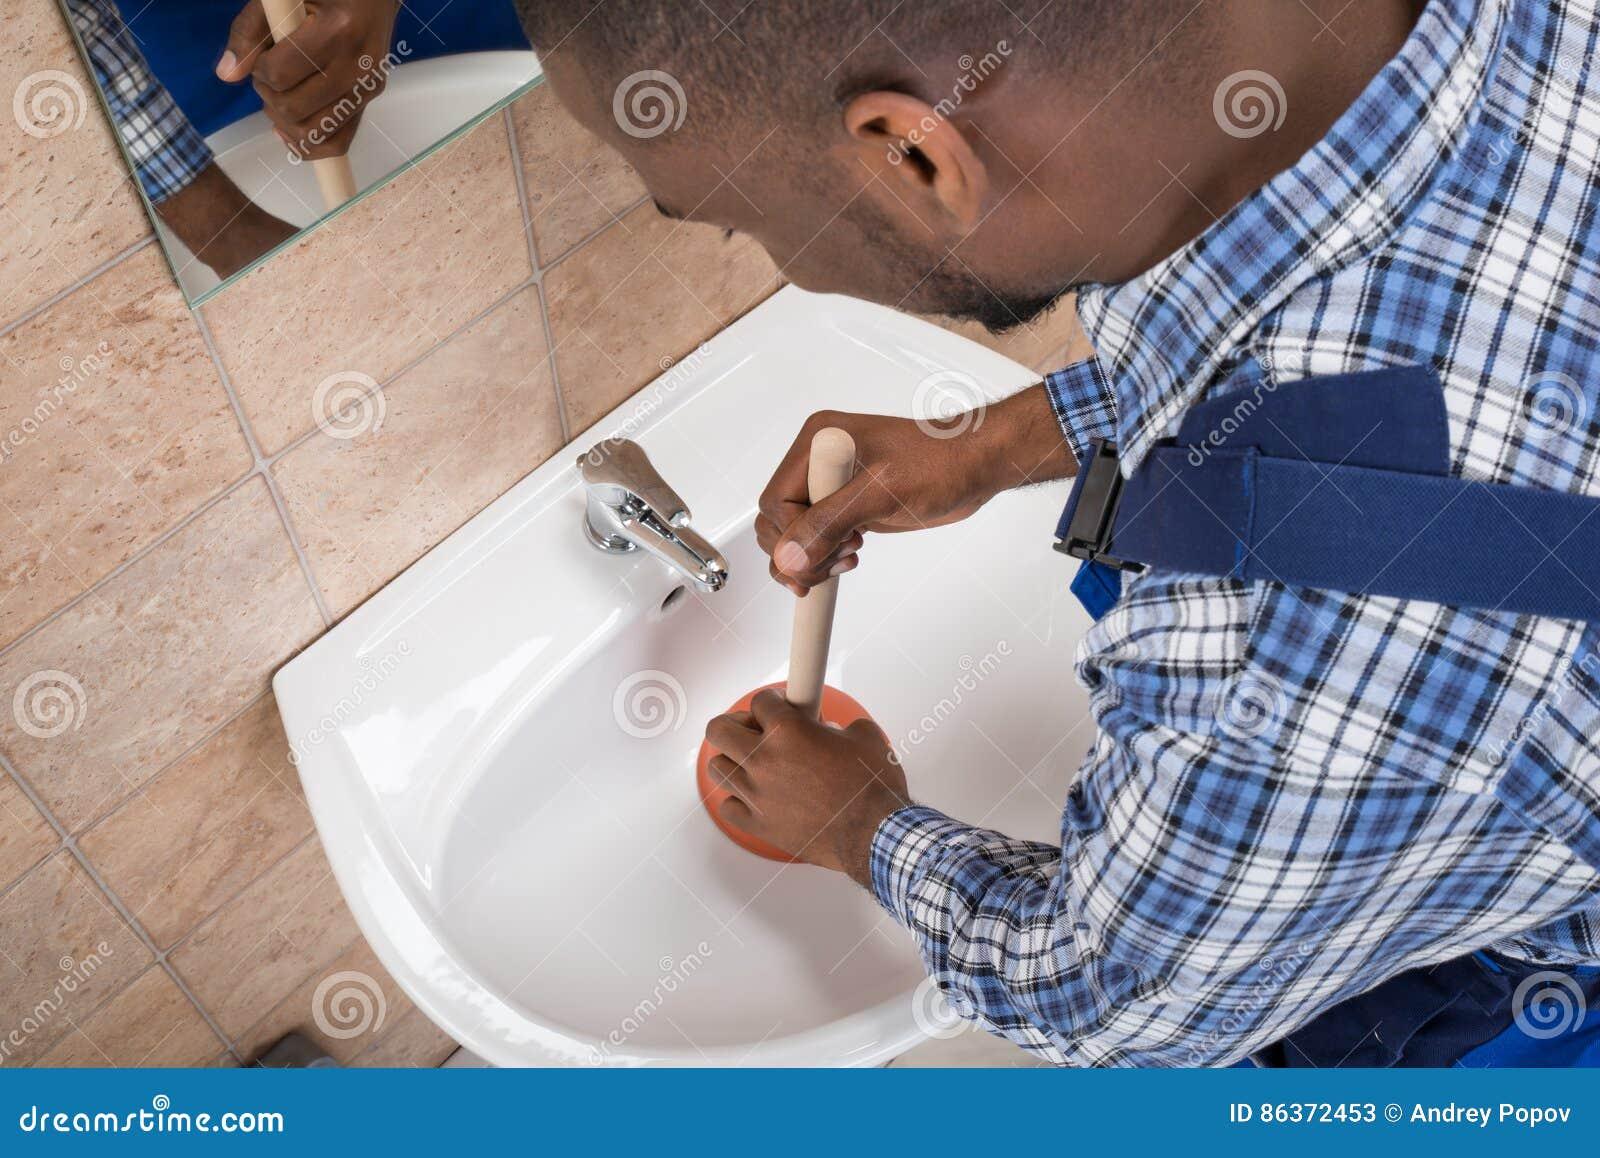 Plumber`s Hand Using Plunger In Bathroom Sink